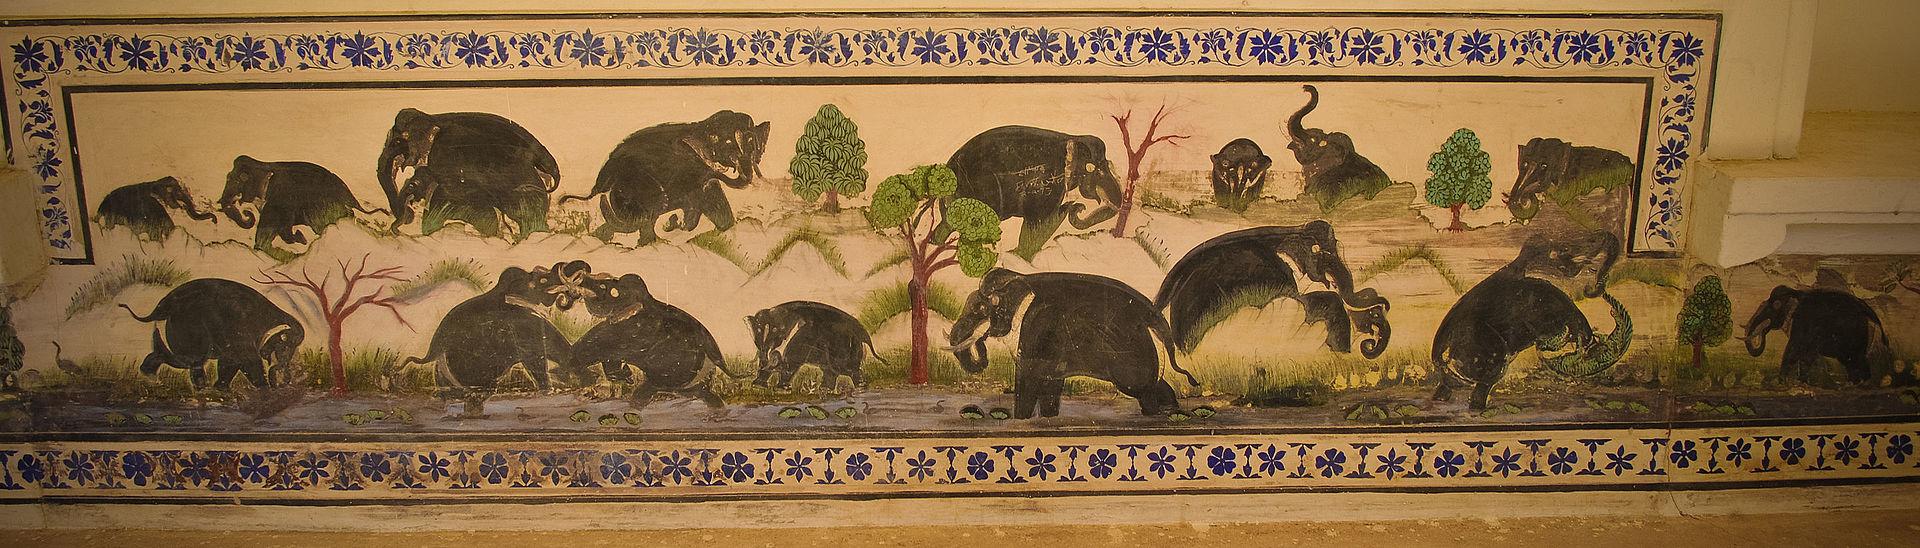 Fresco_on_a_wall_inside_Badal_Mahal,_Kumbhalgarh_fort,_Udaipur_01.jpg